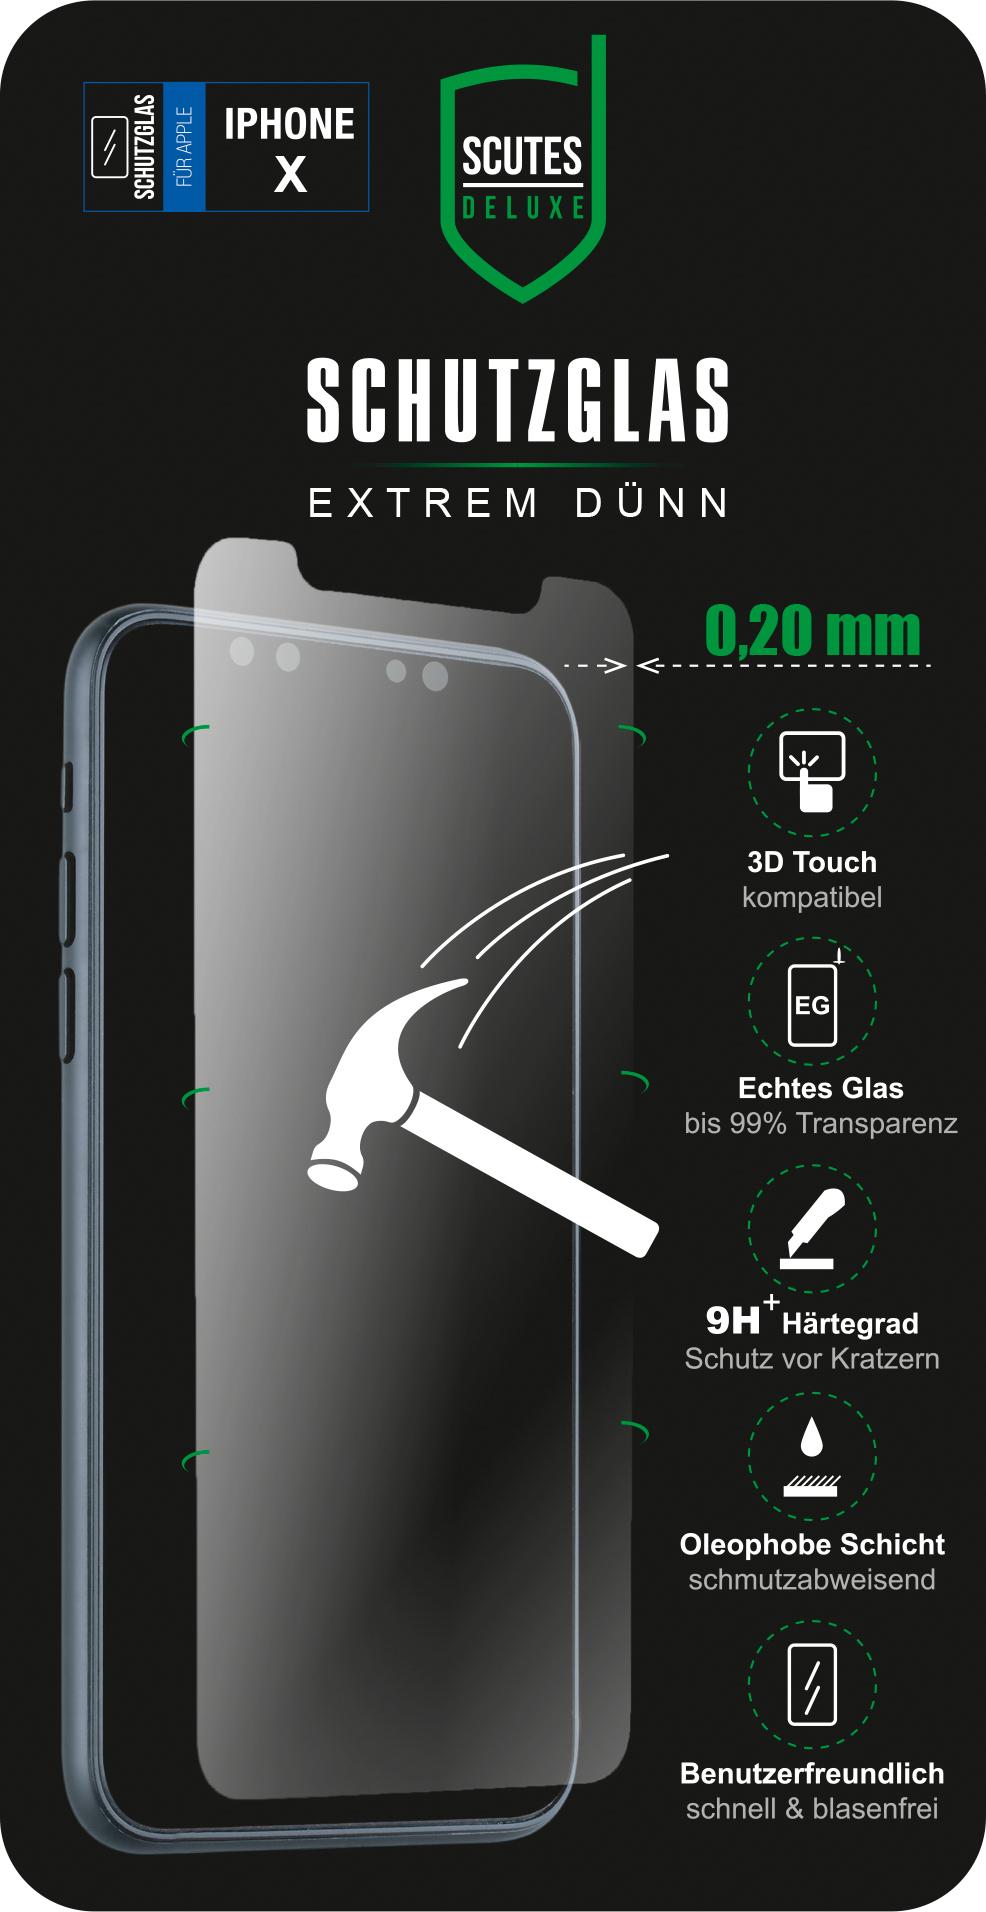 Schutzglas (iPhone X/XS)